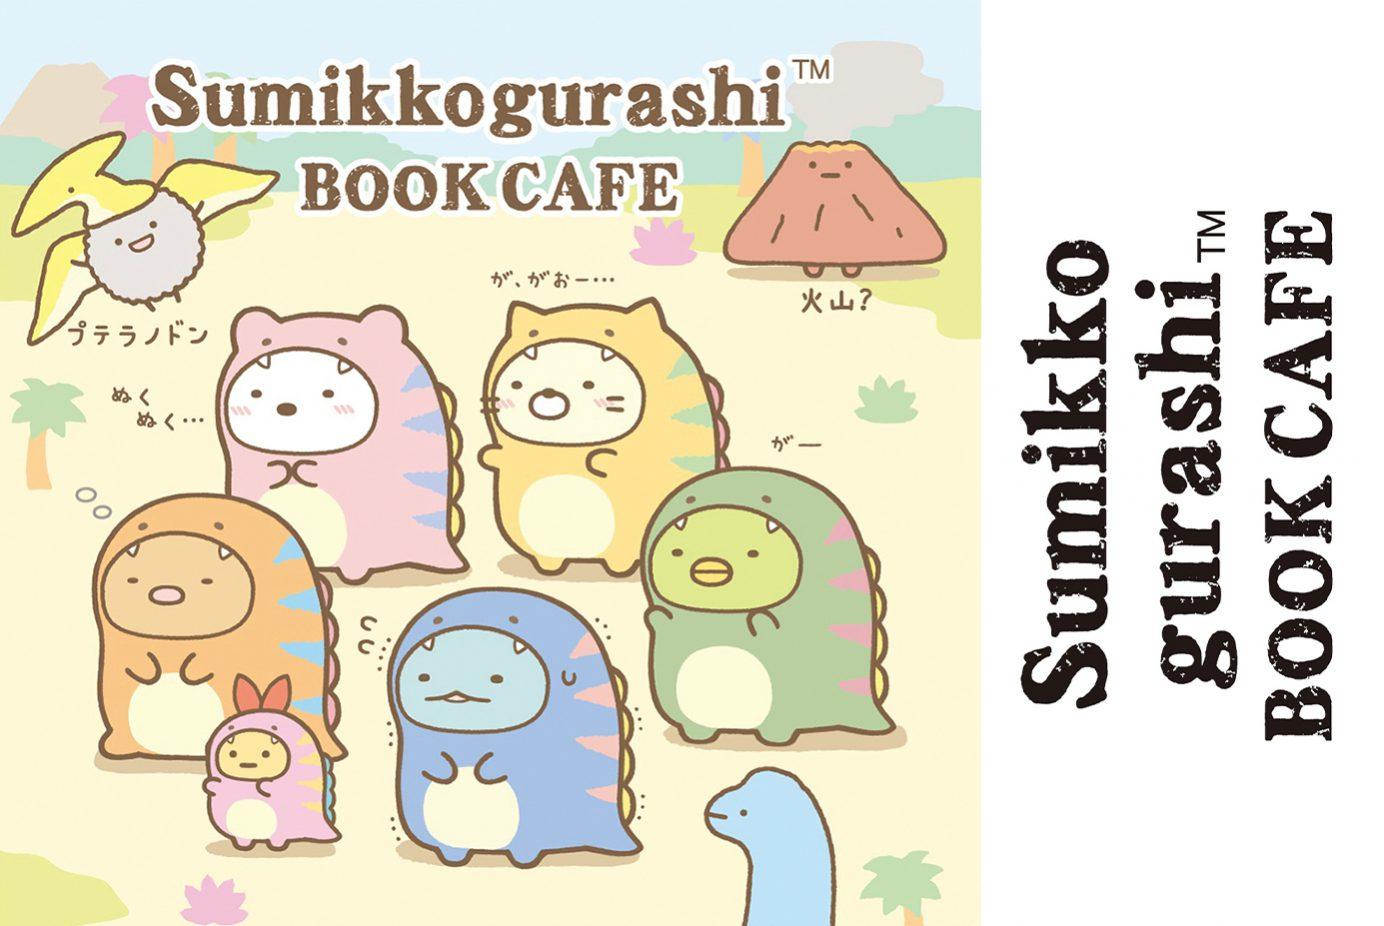 【SWEETS PARADISE限定分店】角落生物BOOK CAFÉ,吃到飽甜點店讓你煩惱通通GO AWAY